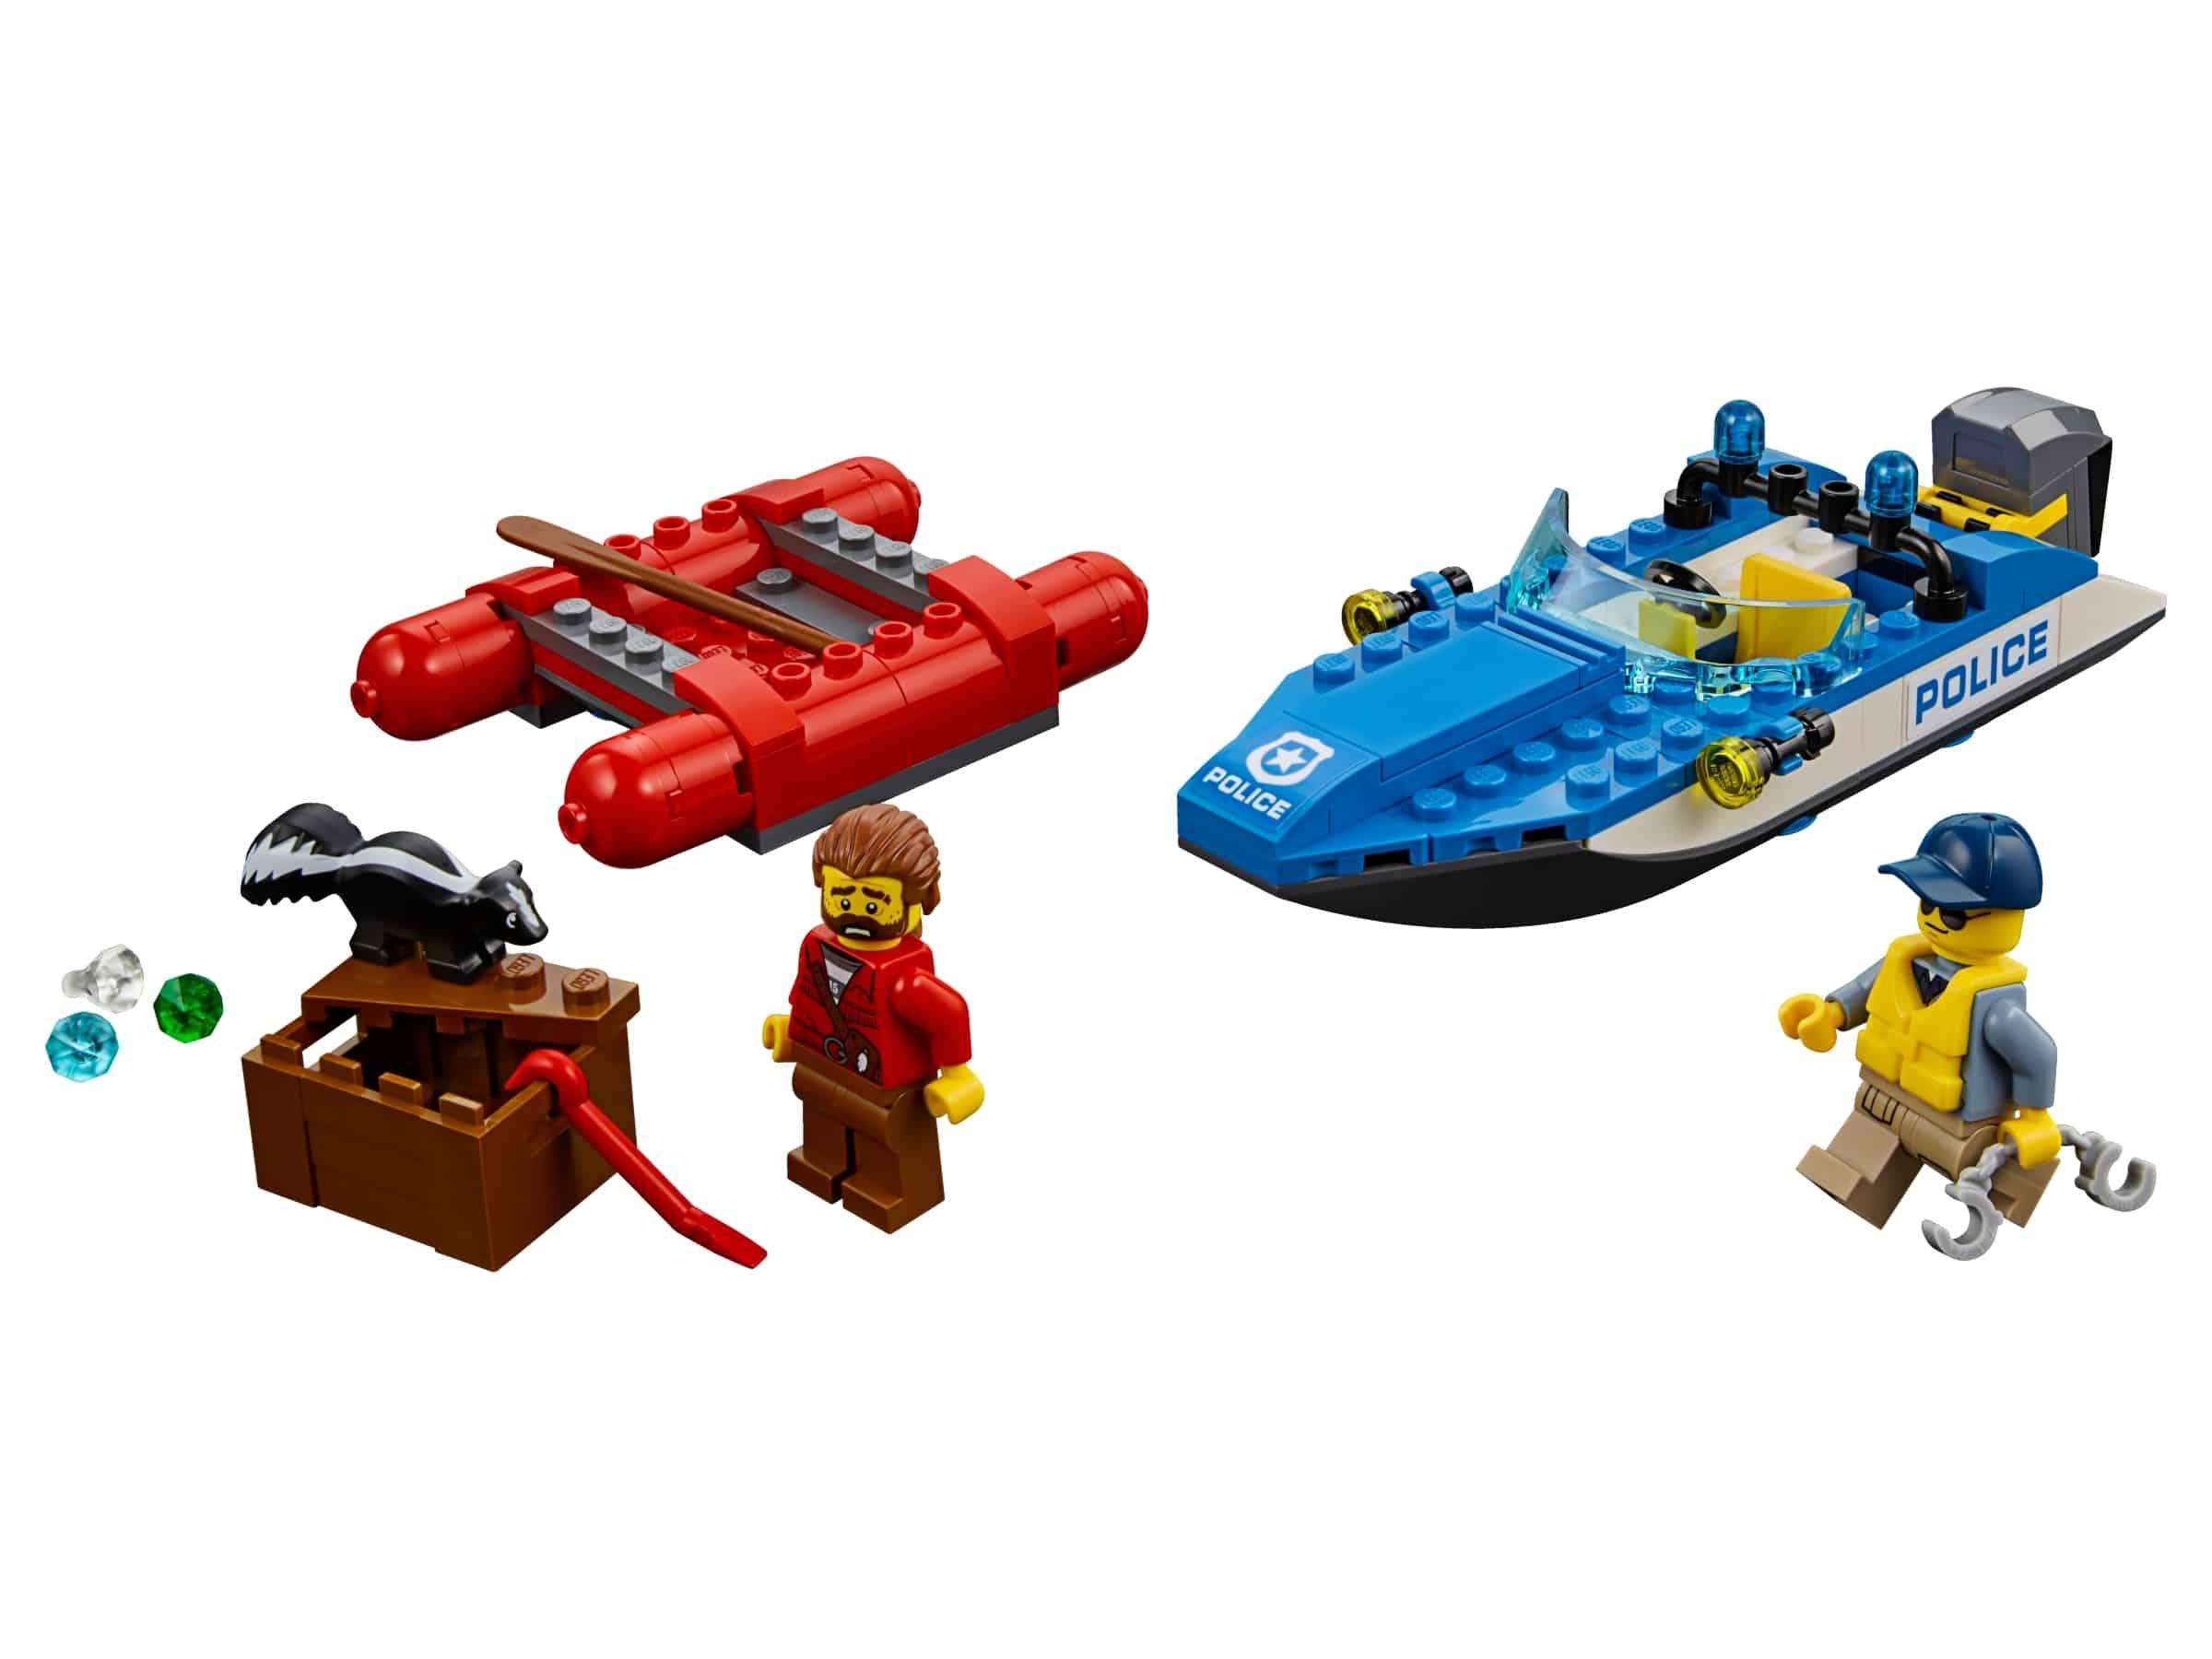 lego wilde rivierontsnapping 60176